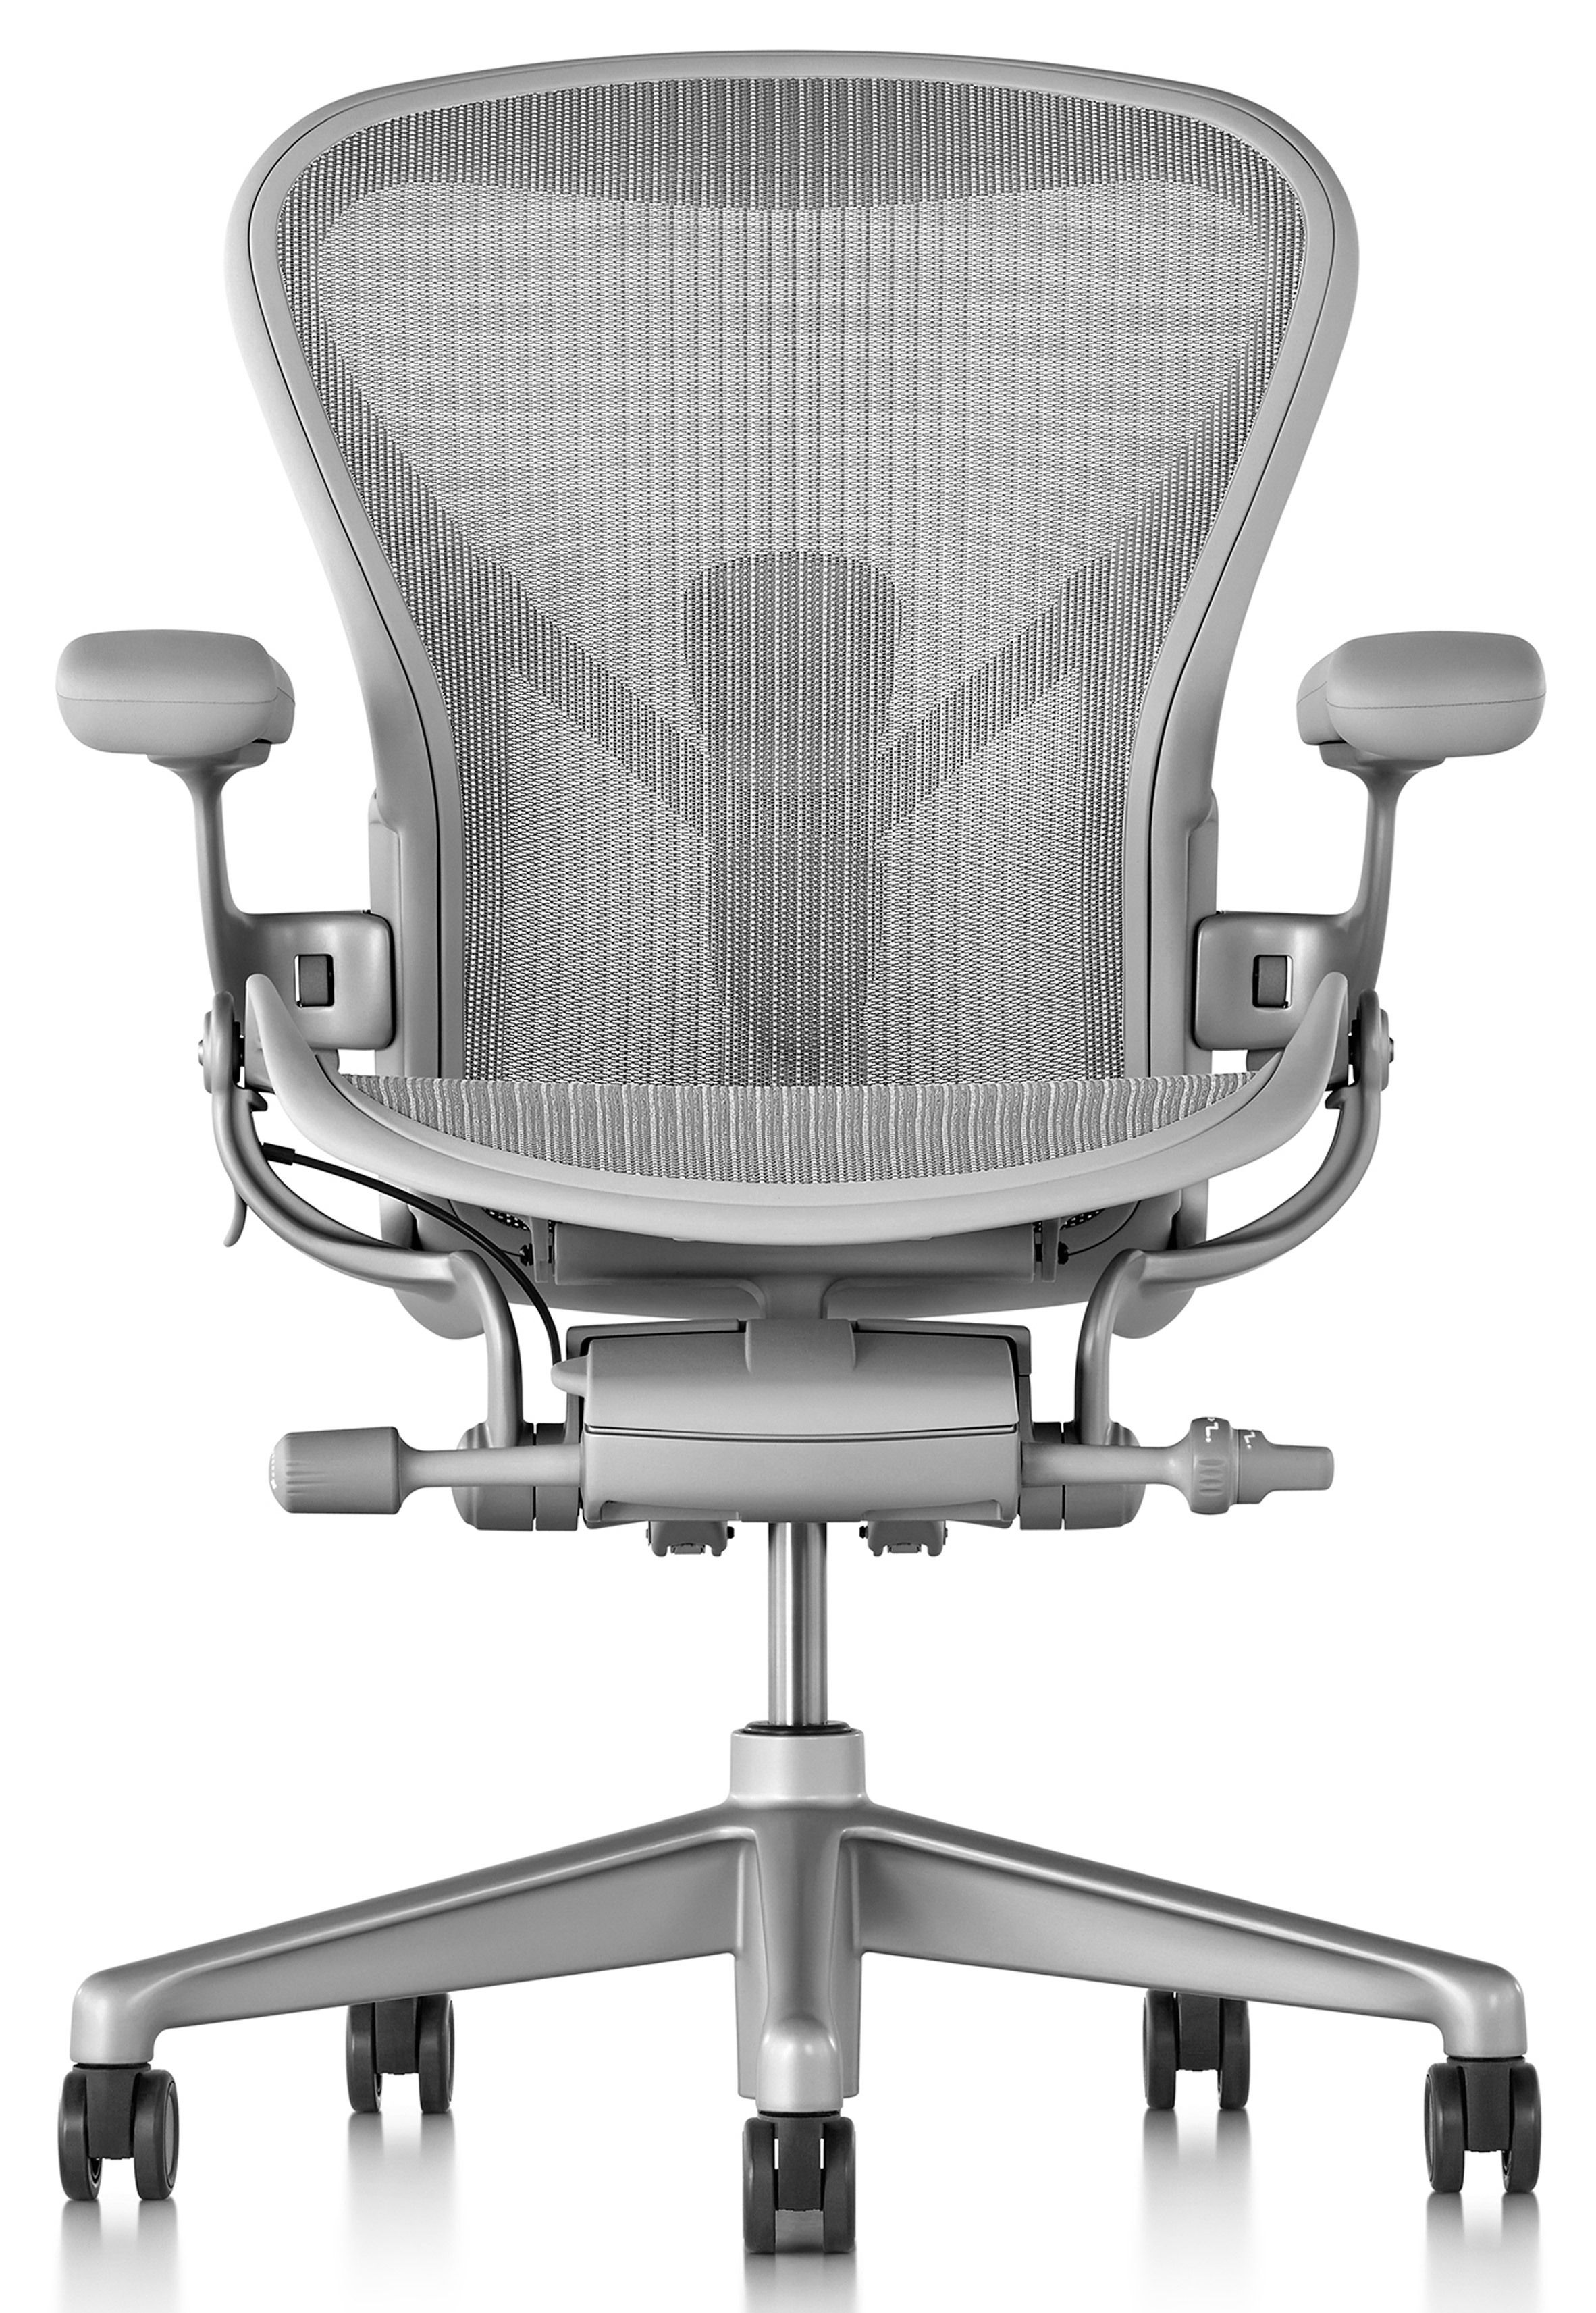 Herman Miller updates iconic Aeron office chair | Best